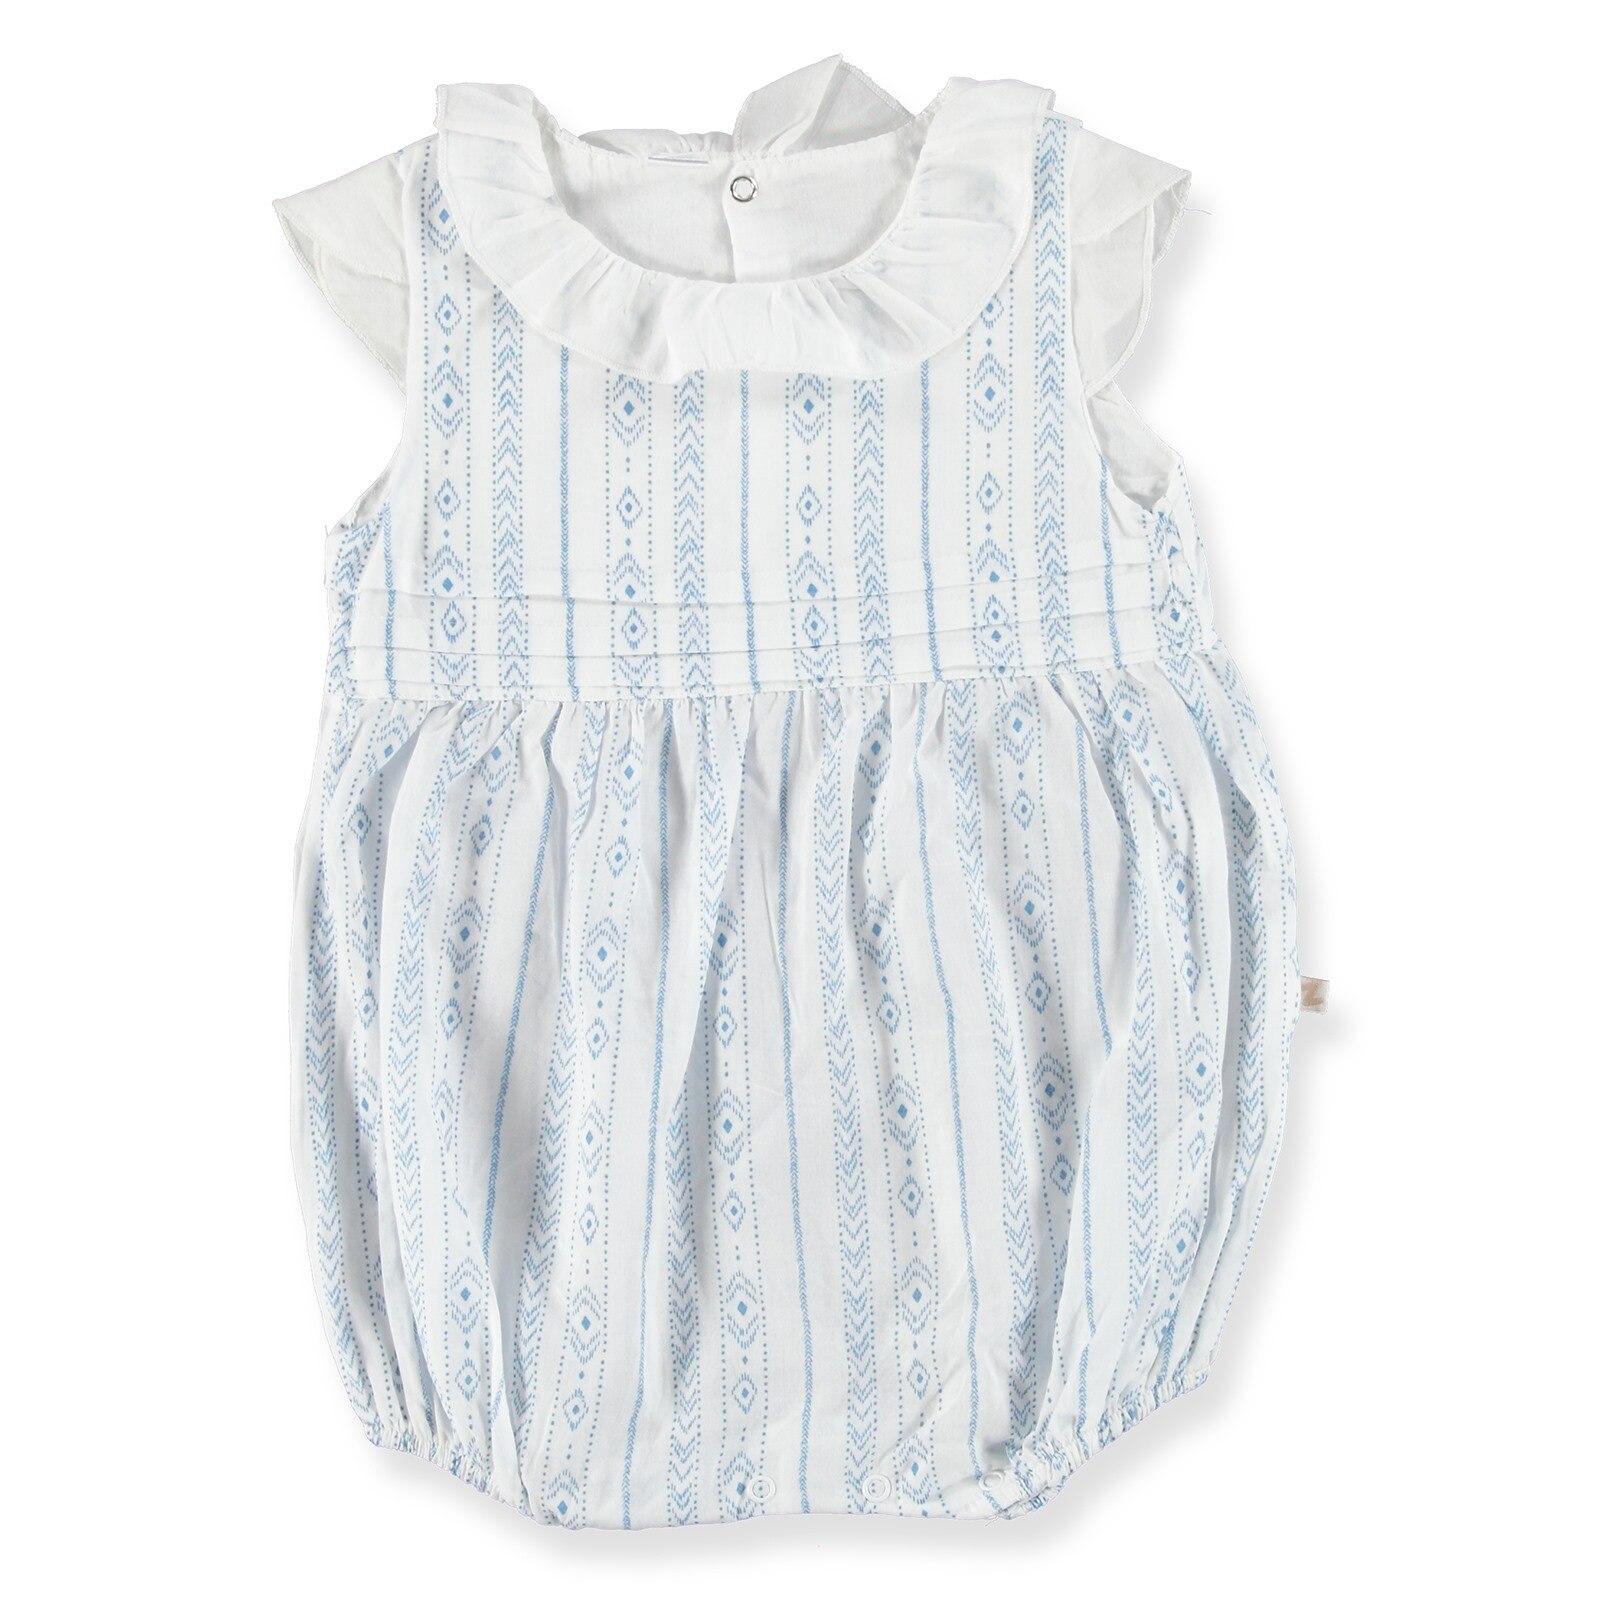 BabyZ Ruffled Collar Texture Baby Short Romper